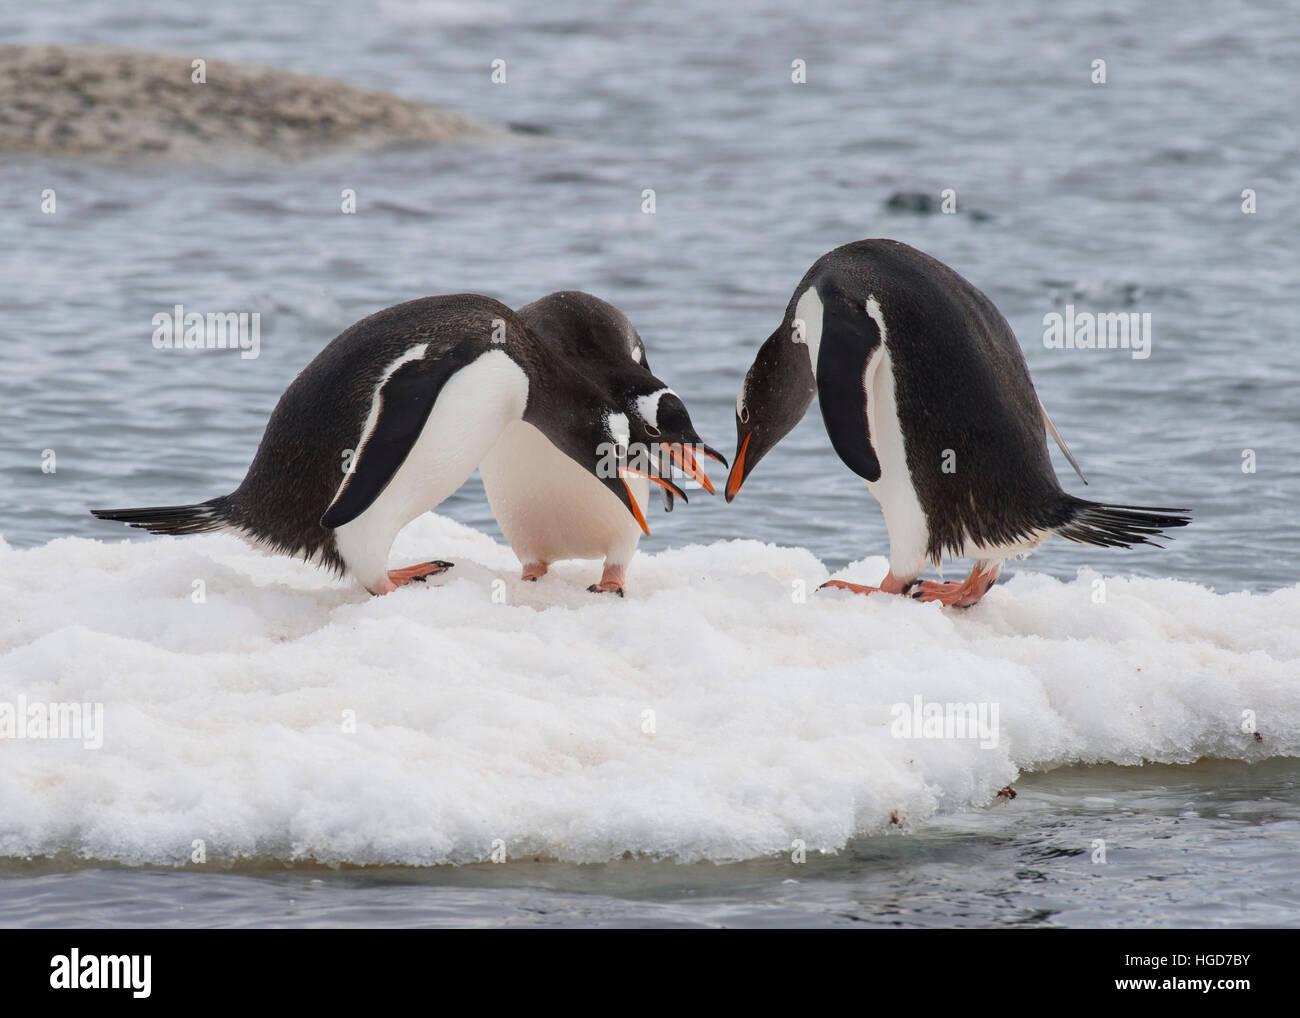 Gentoo Penguin on the ice - Stock Image